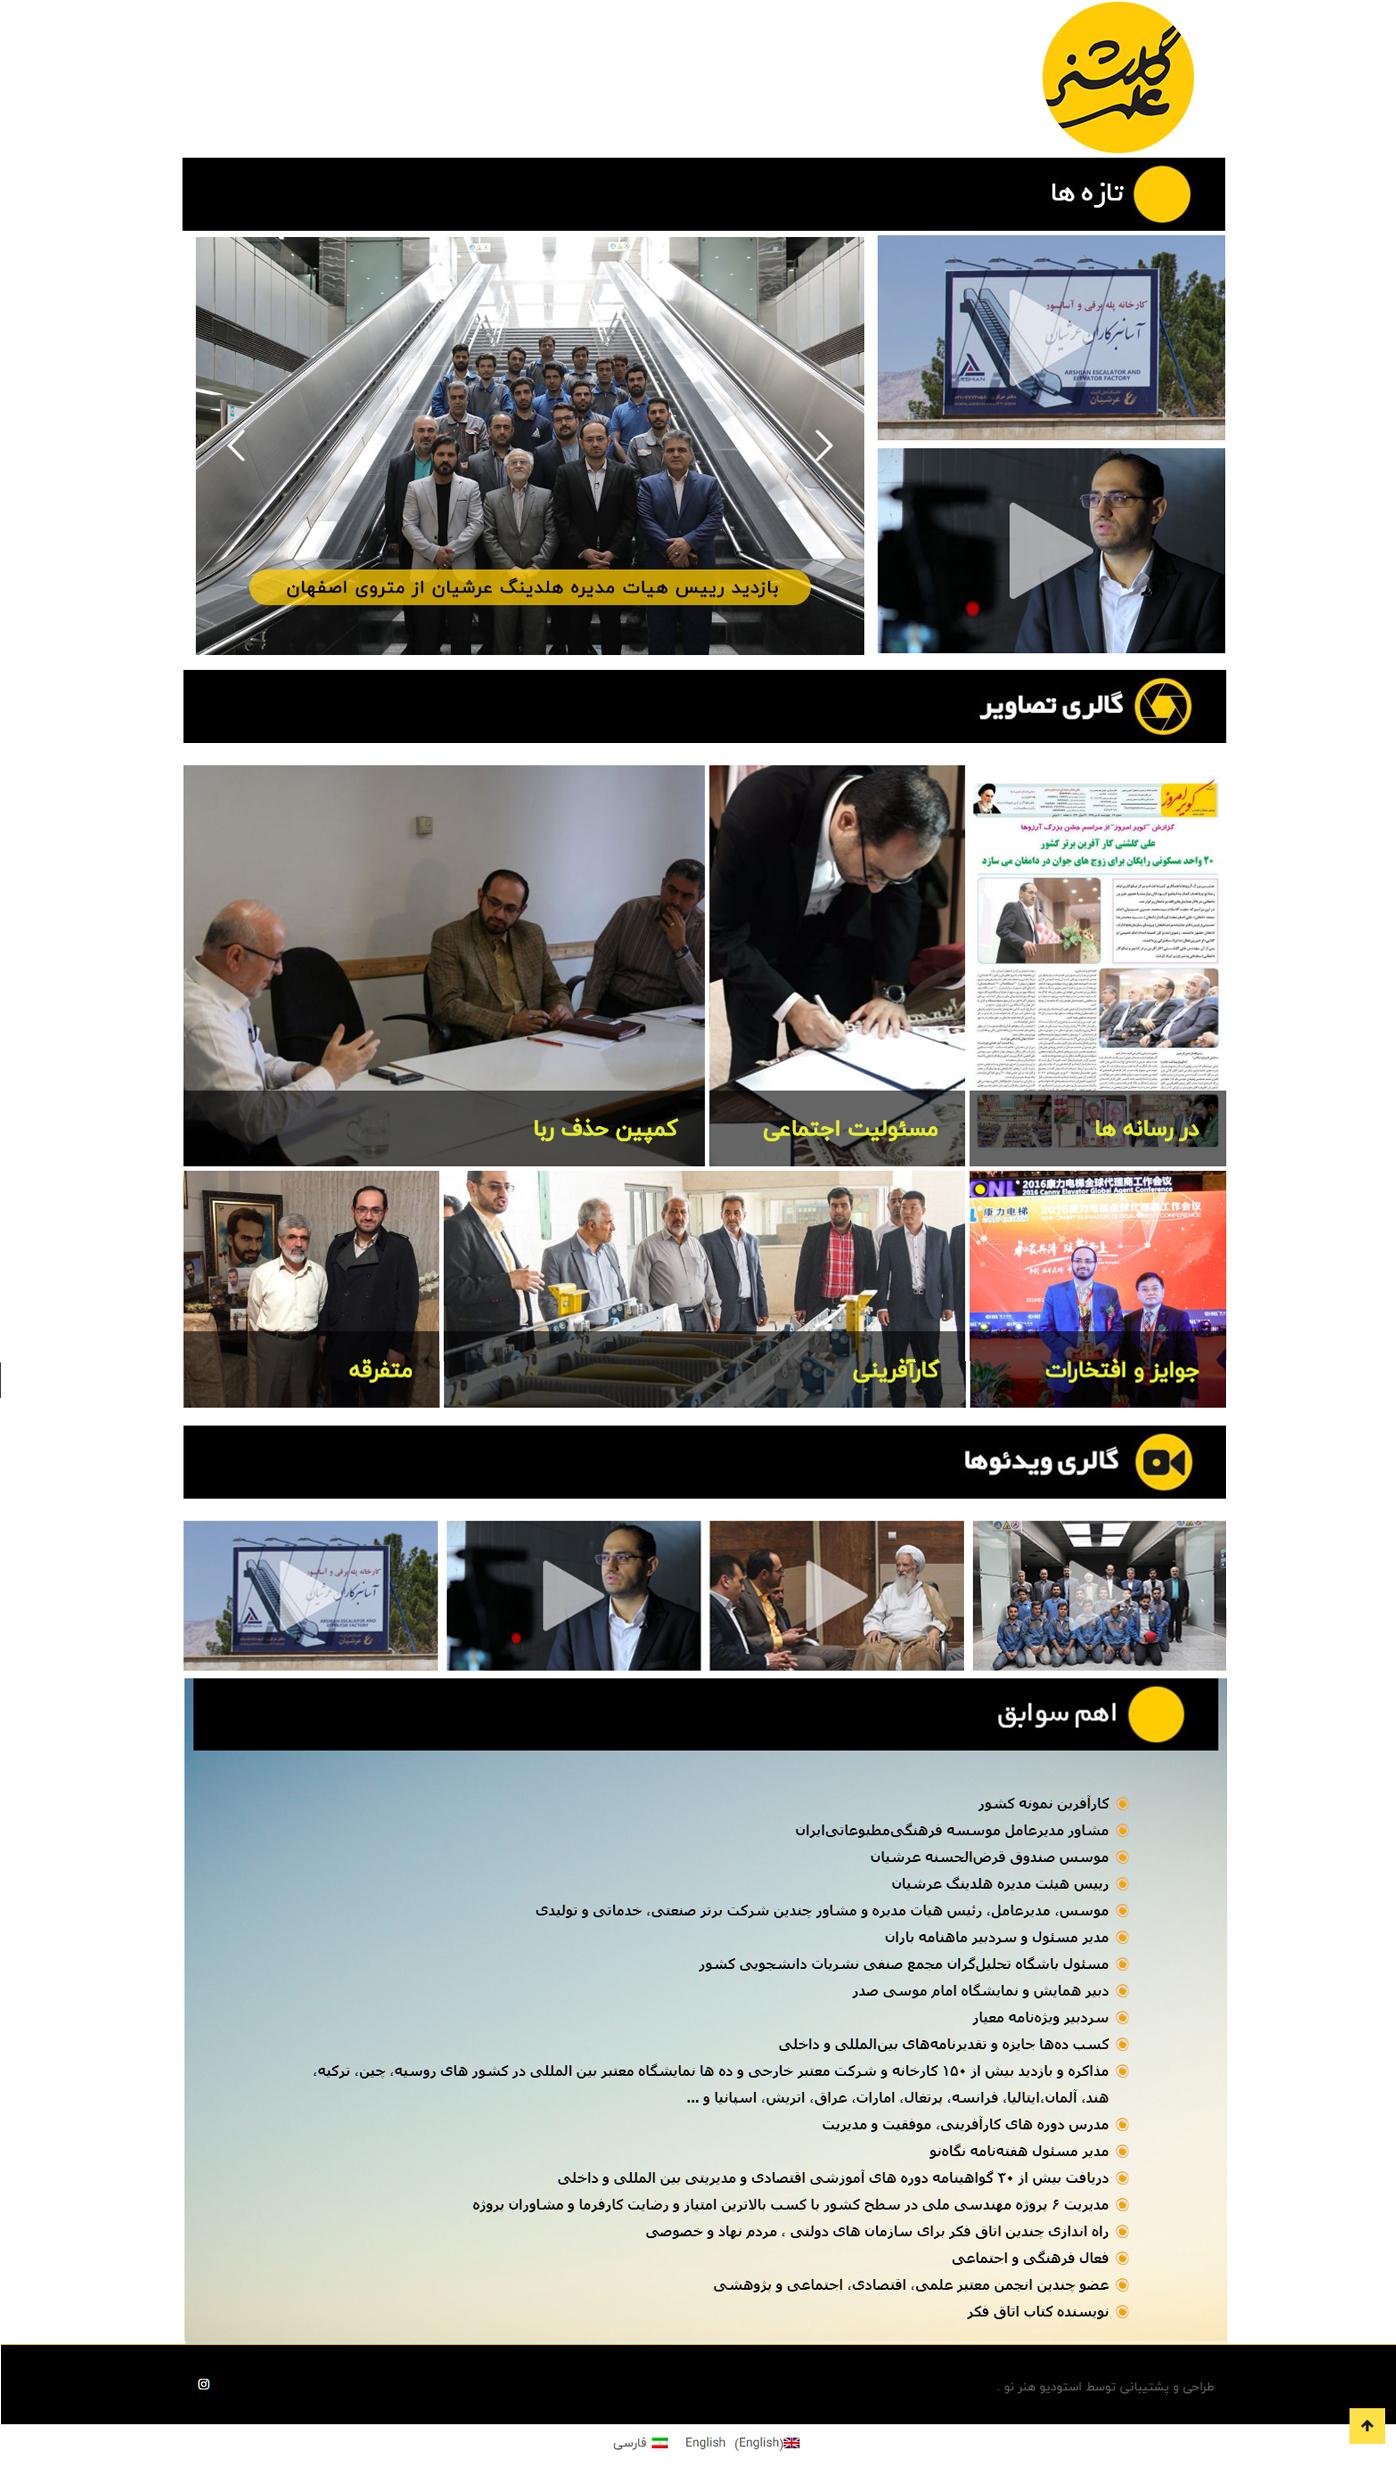 Artboard 1 copy 1 - طراحی سایت شخصی مهندس علی گلشنی